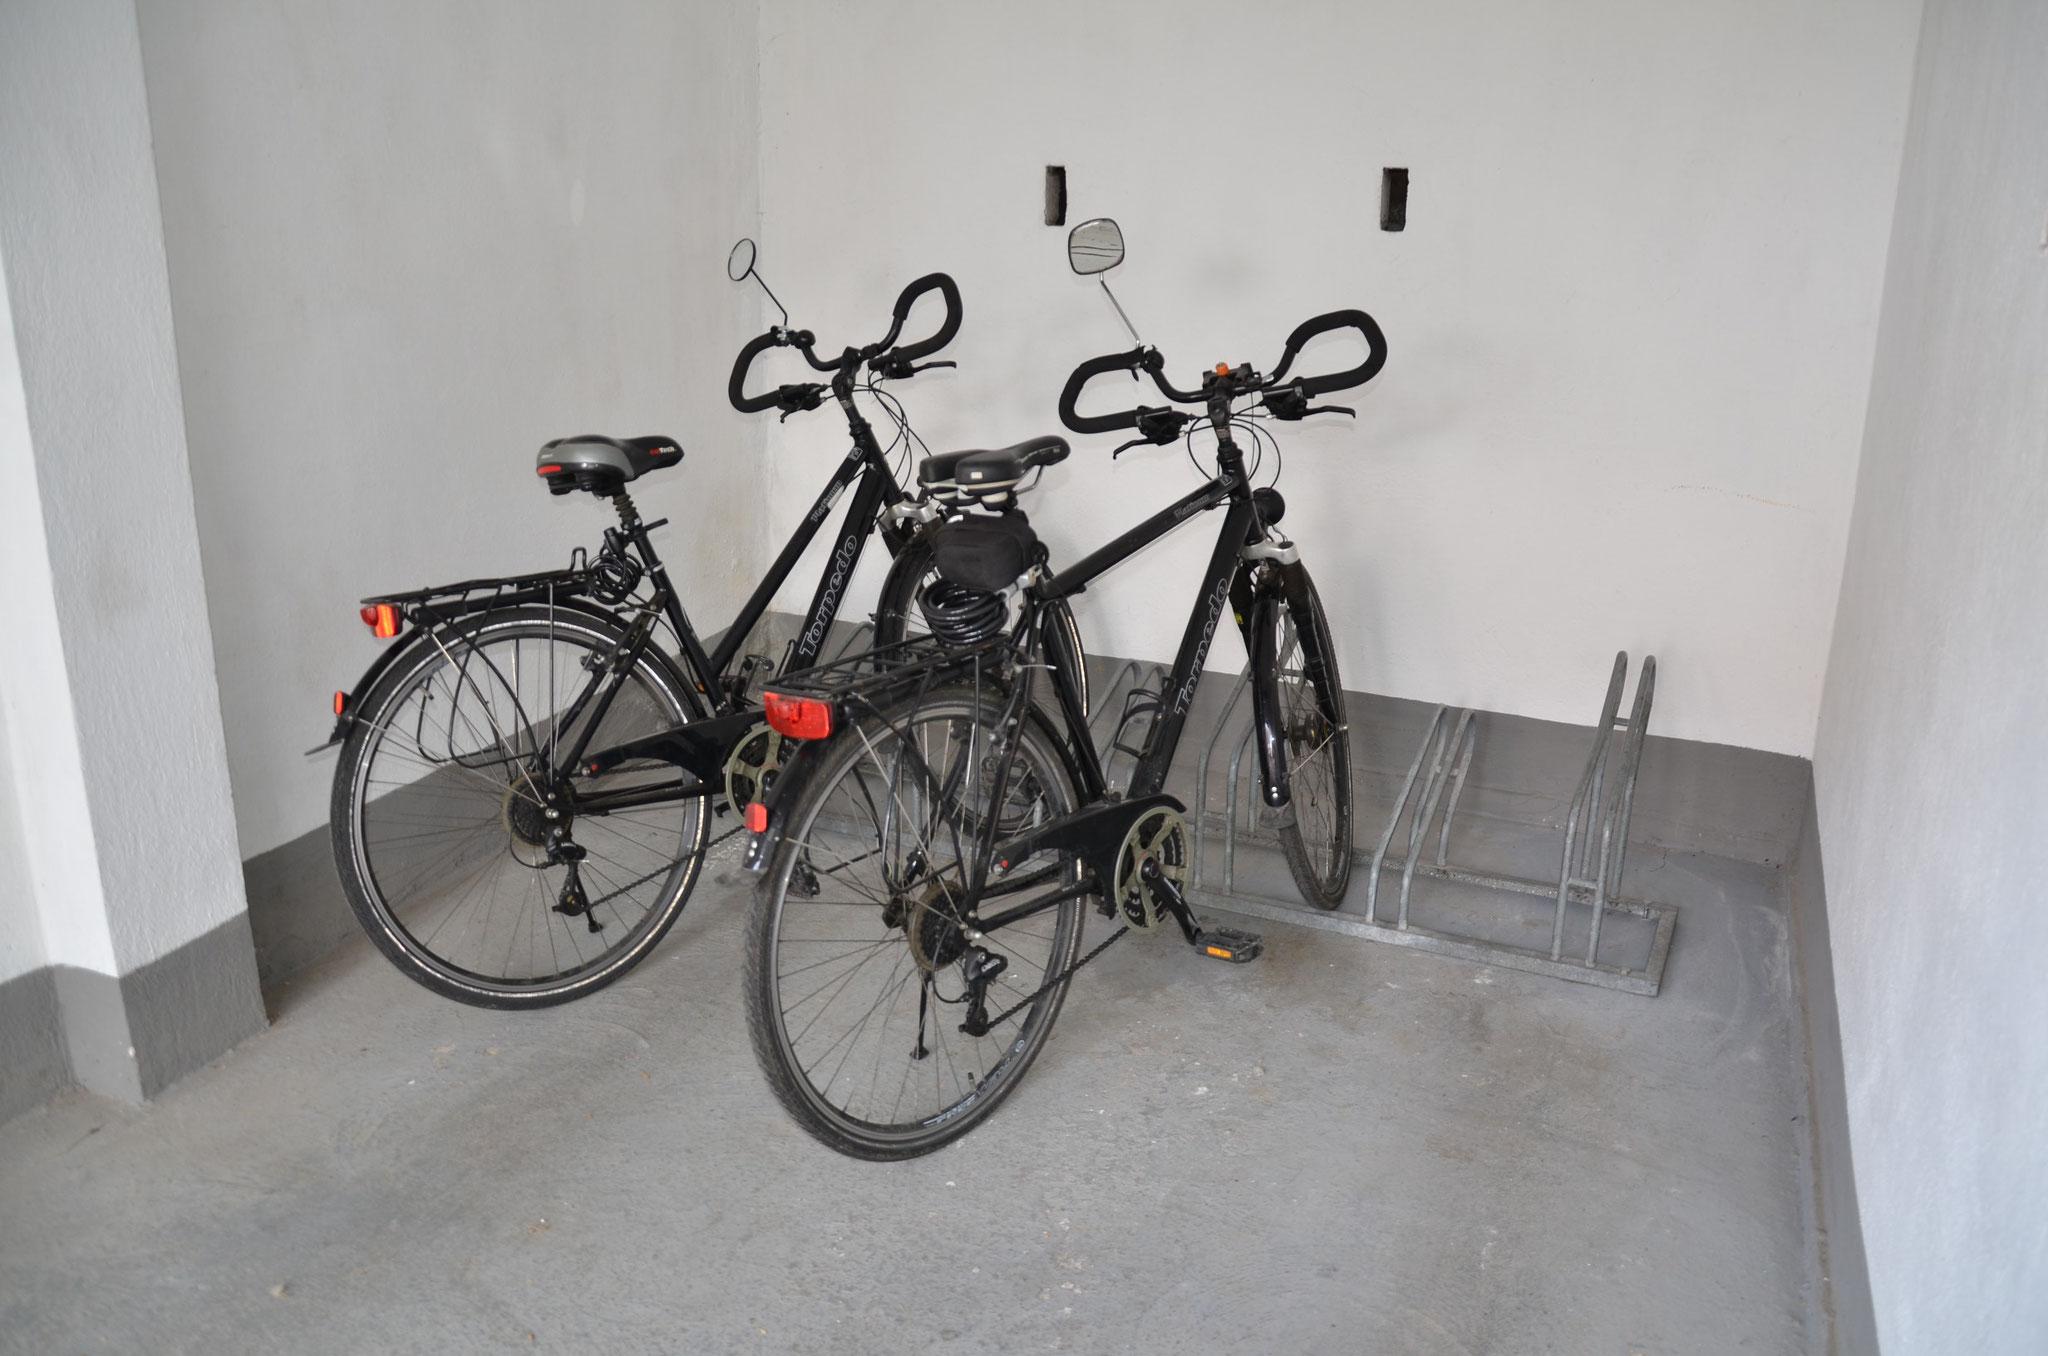 Leihfahrräder